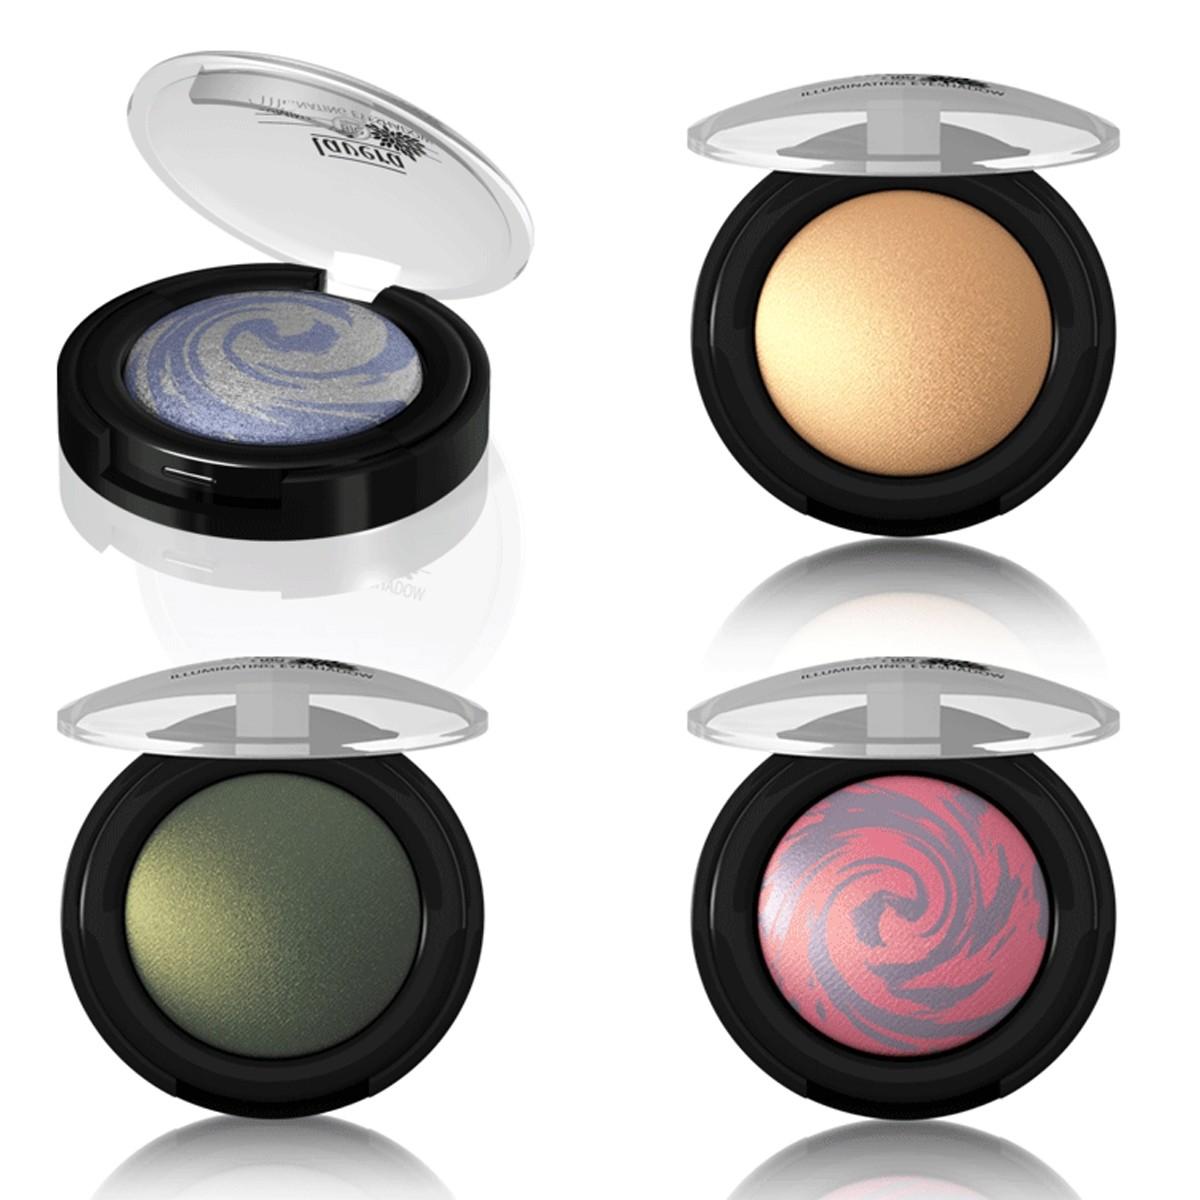 Lavera Illuminating Eyeshadow